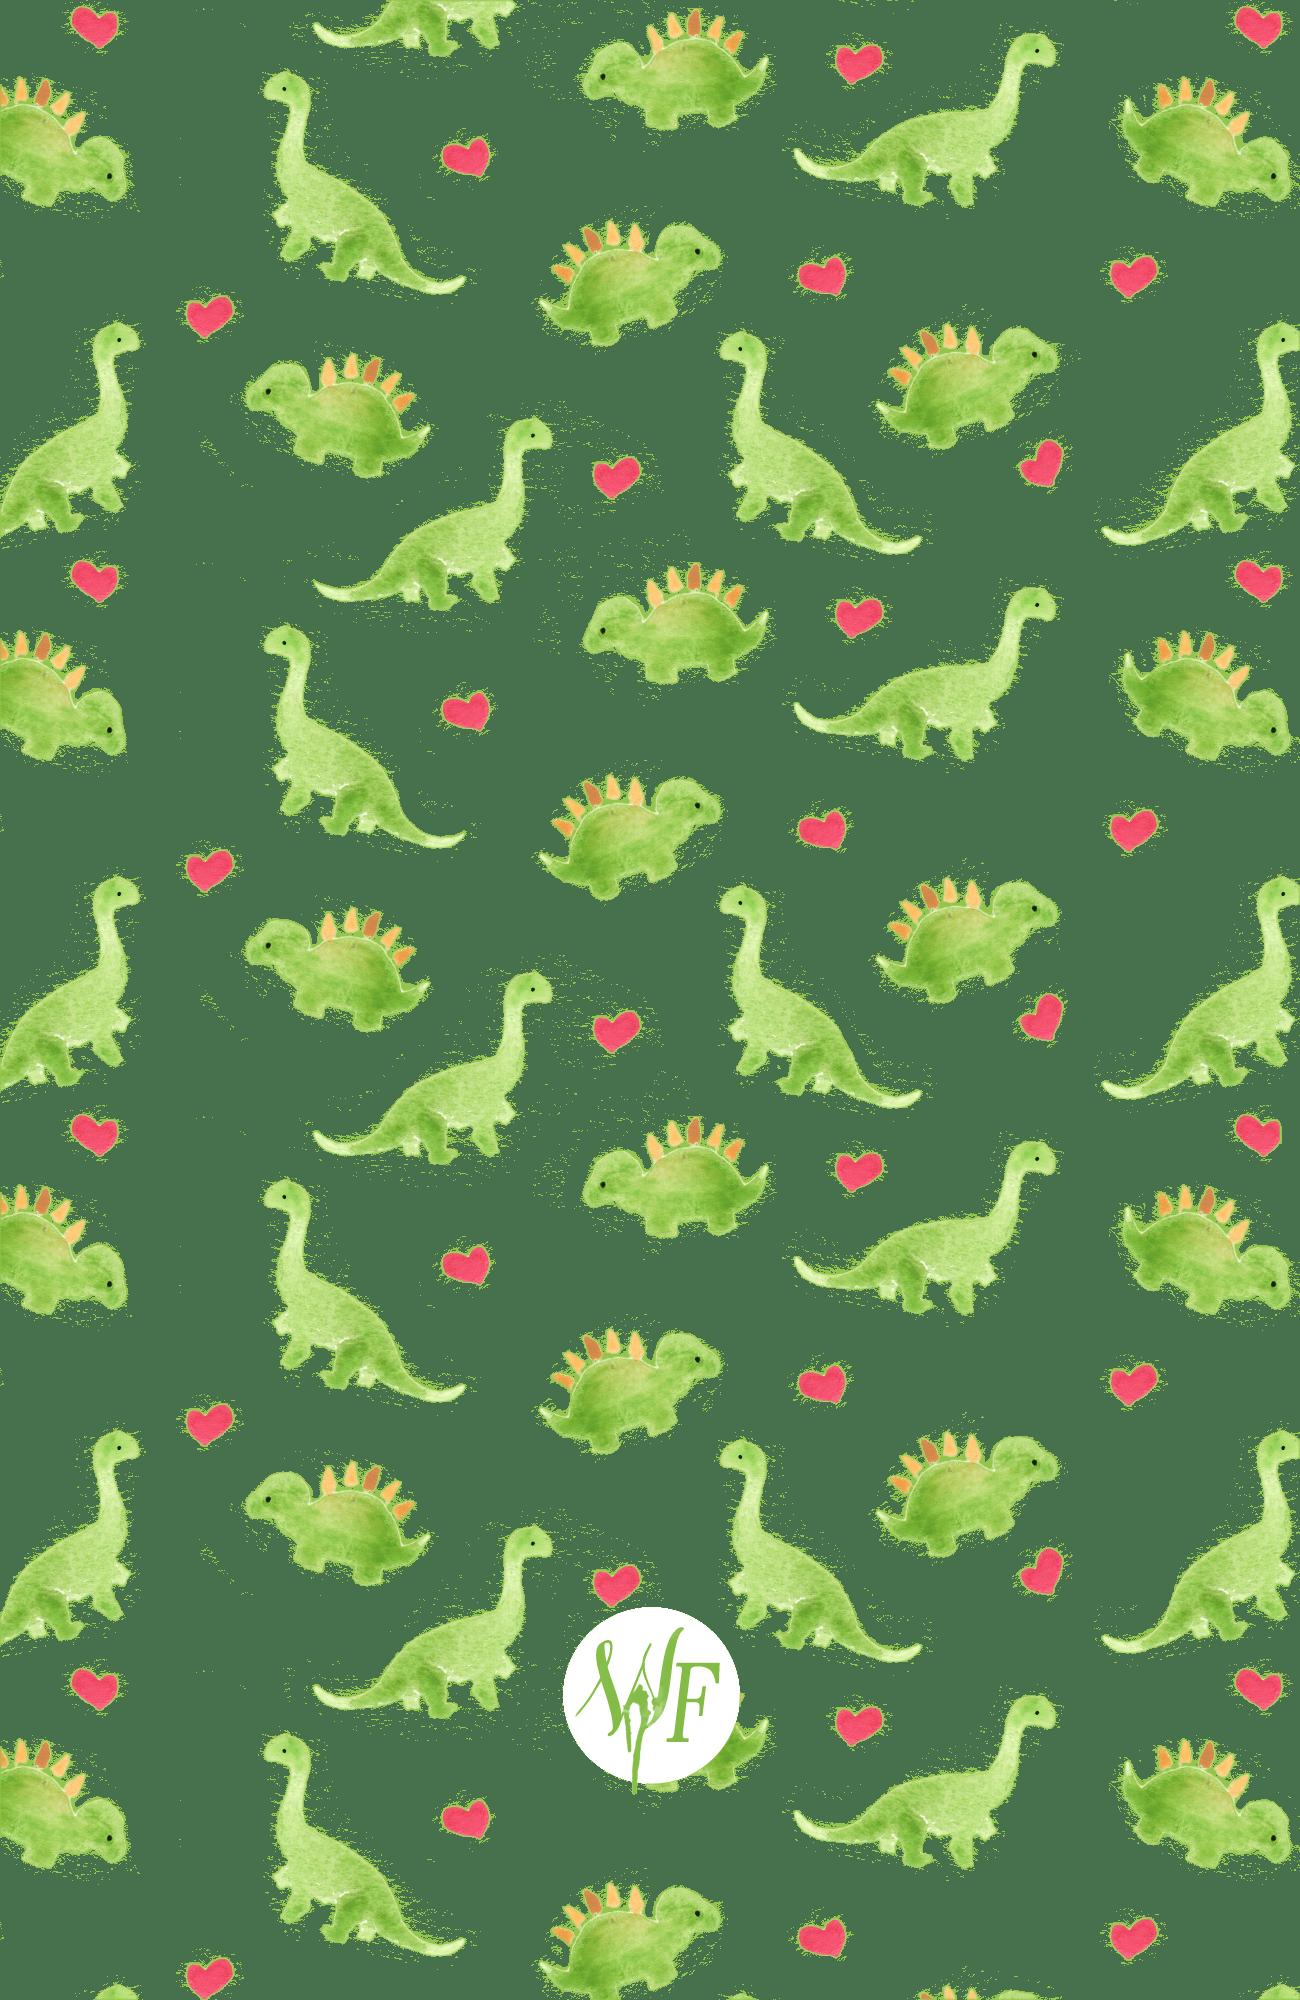 Dinosaur Iphone Wallpapers Top Free Dinosaur Iphone Backgrounds Wallpaperaccess